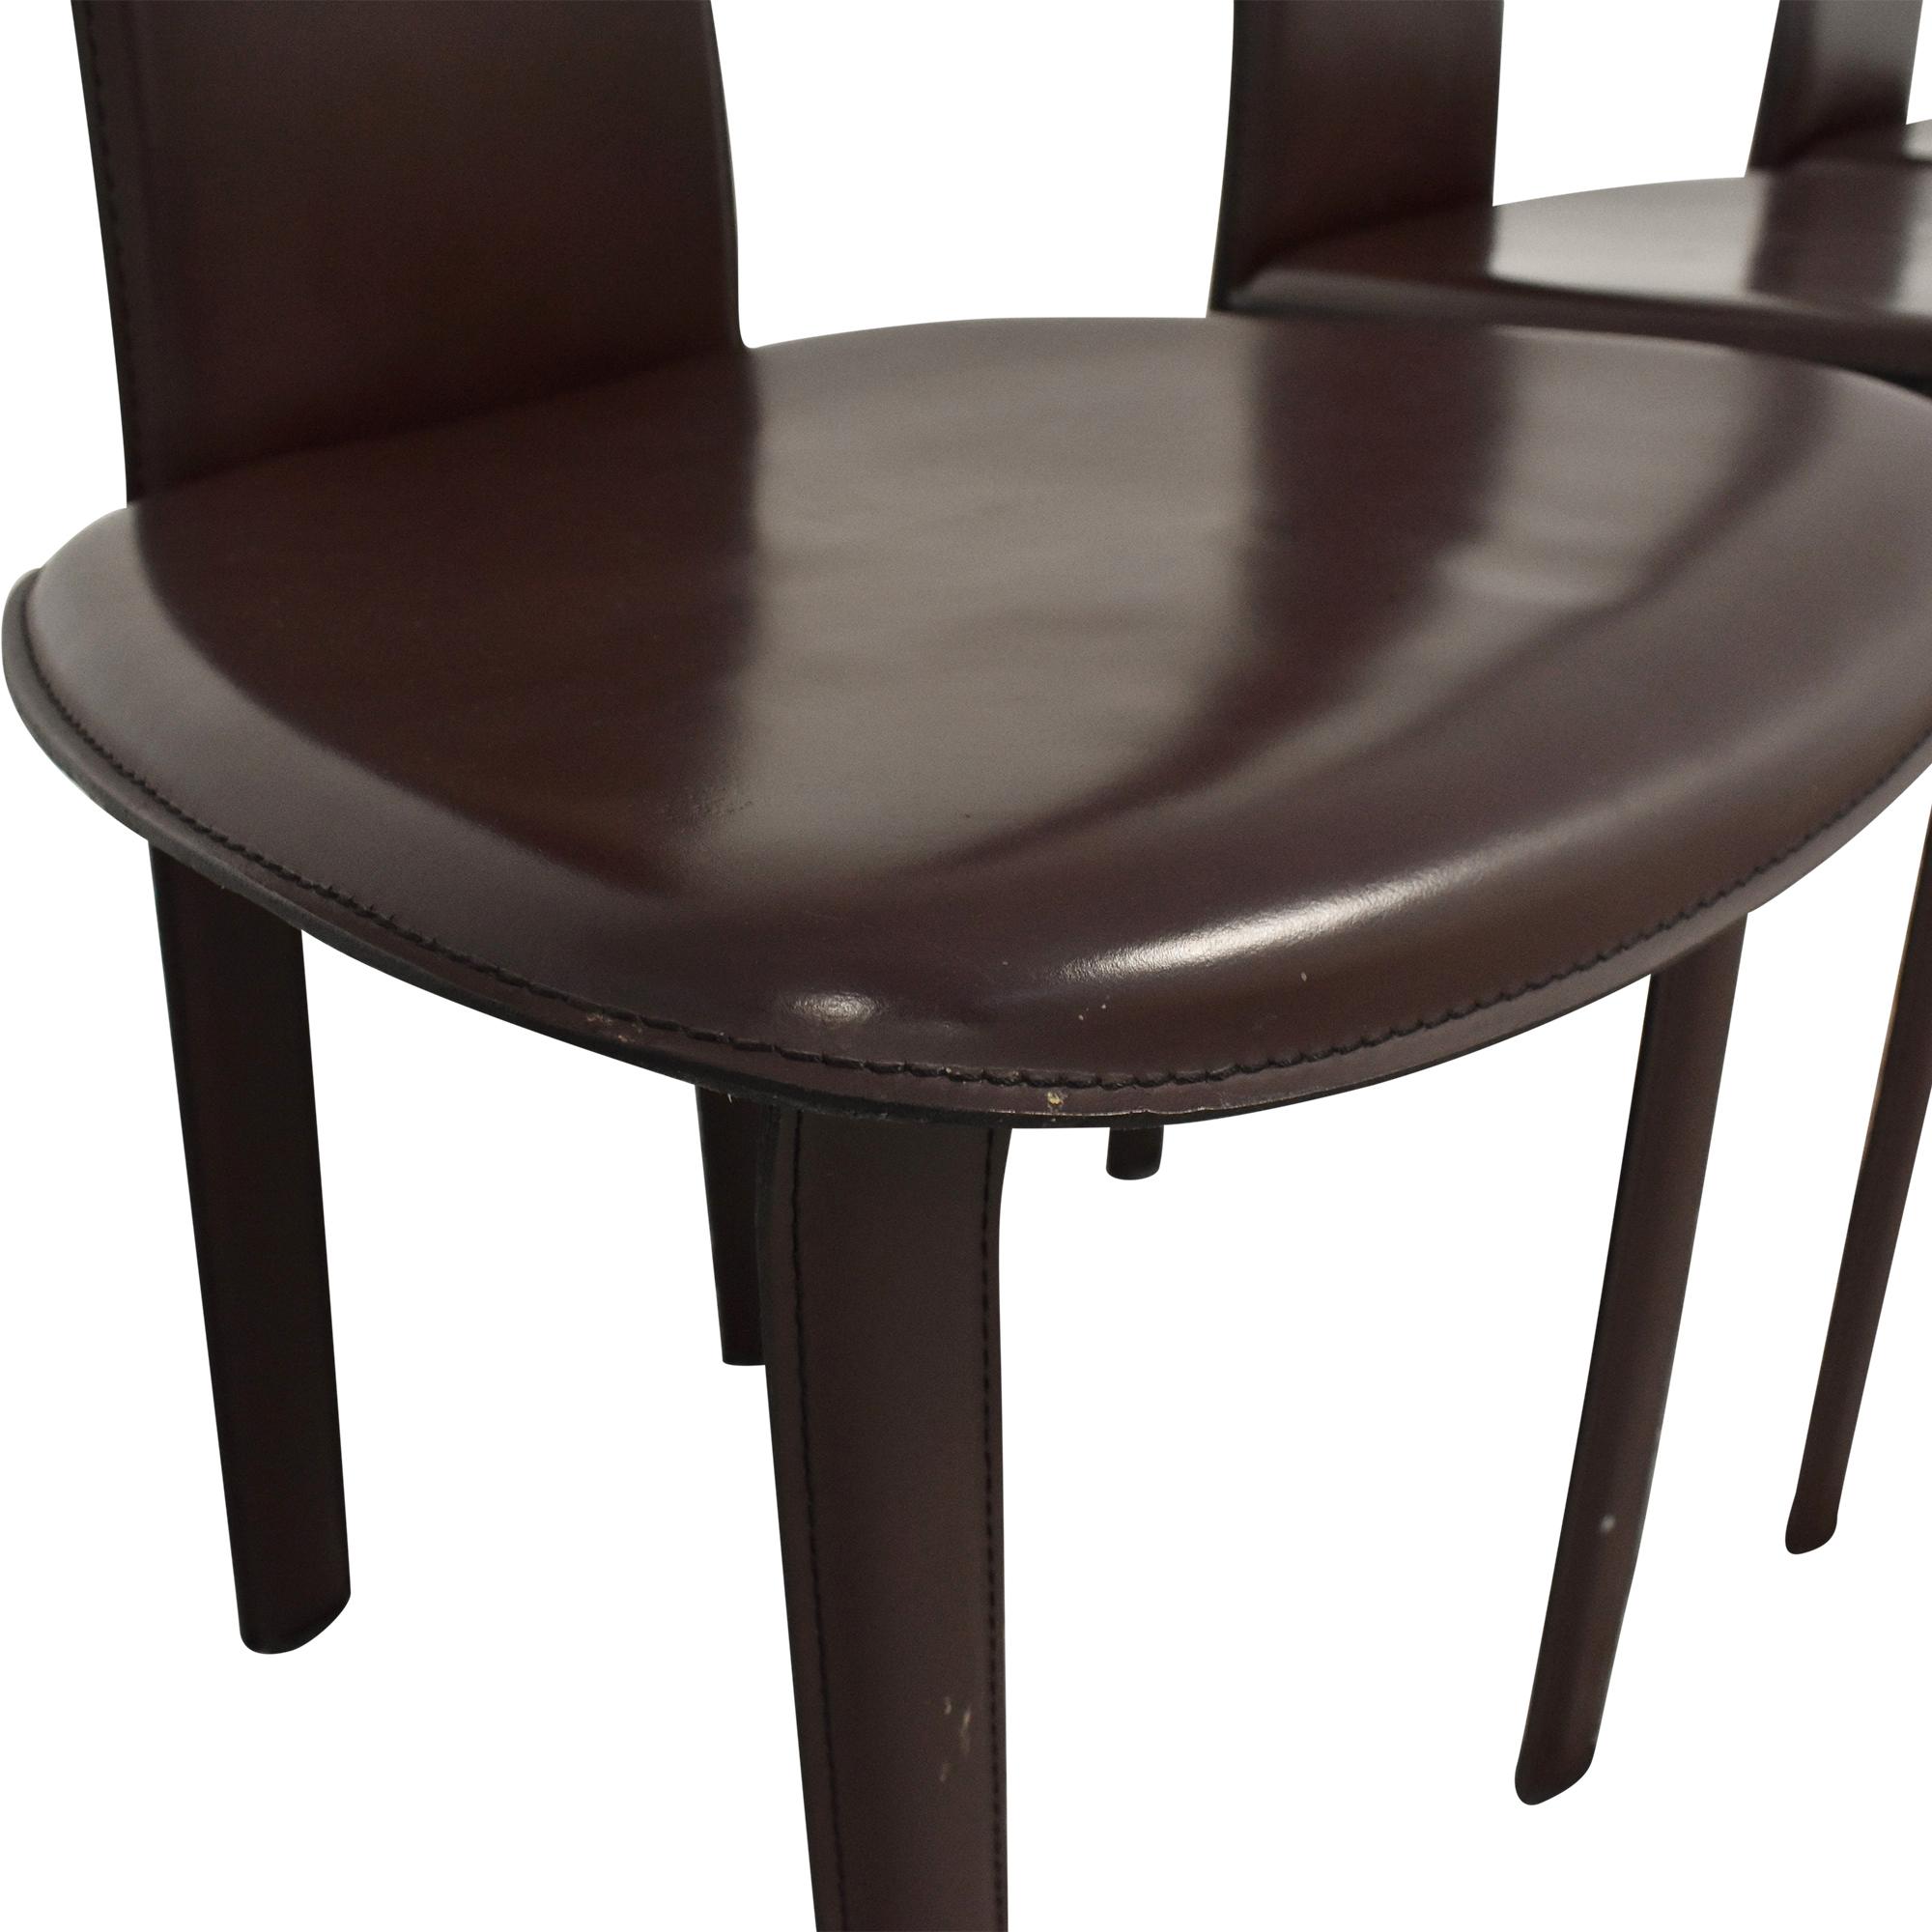 Italian Dining Chairs nyc